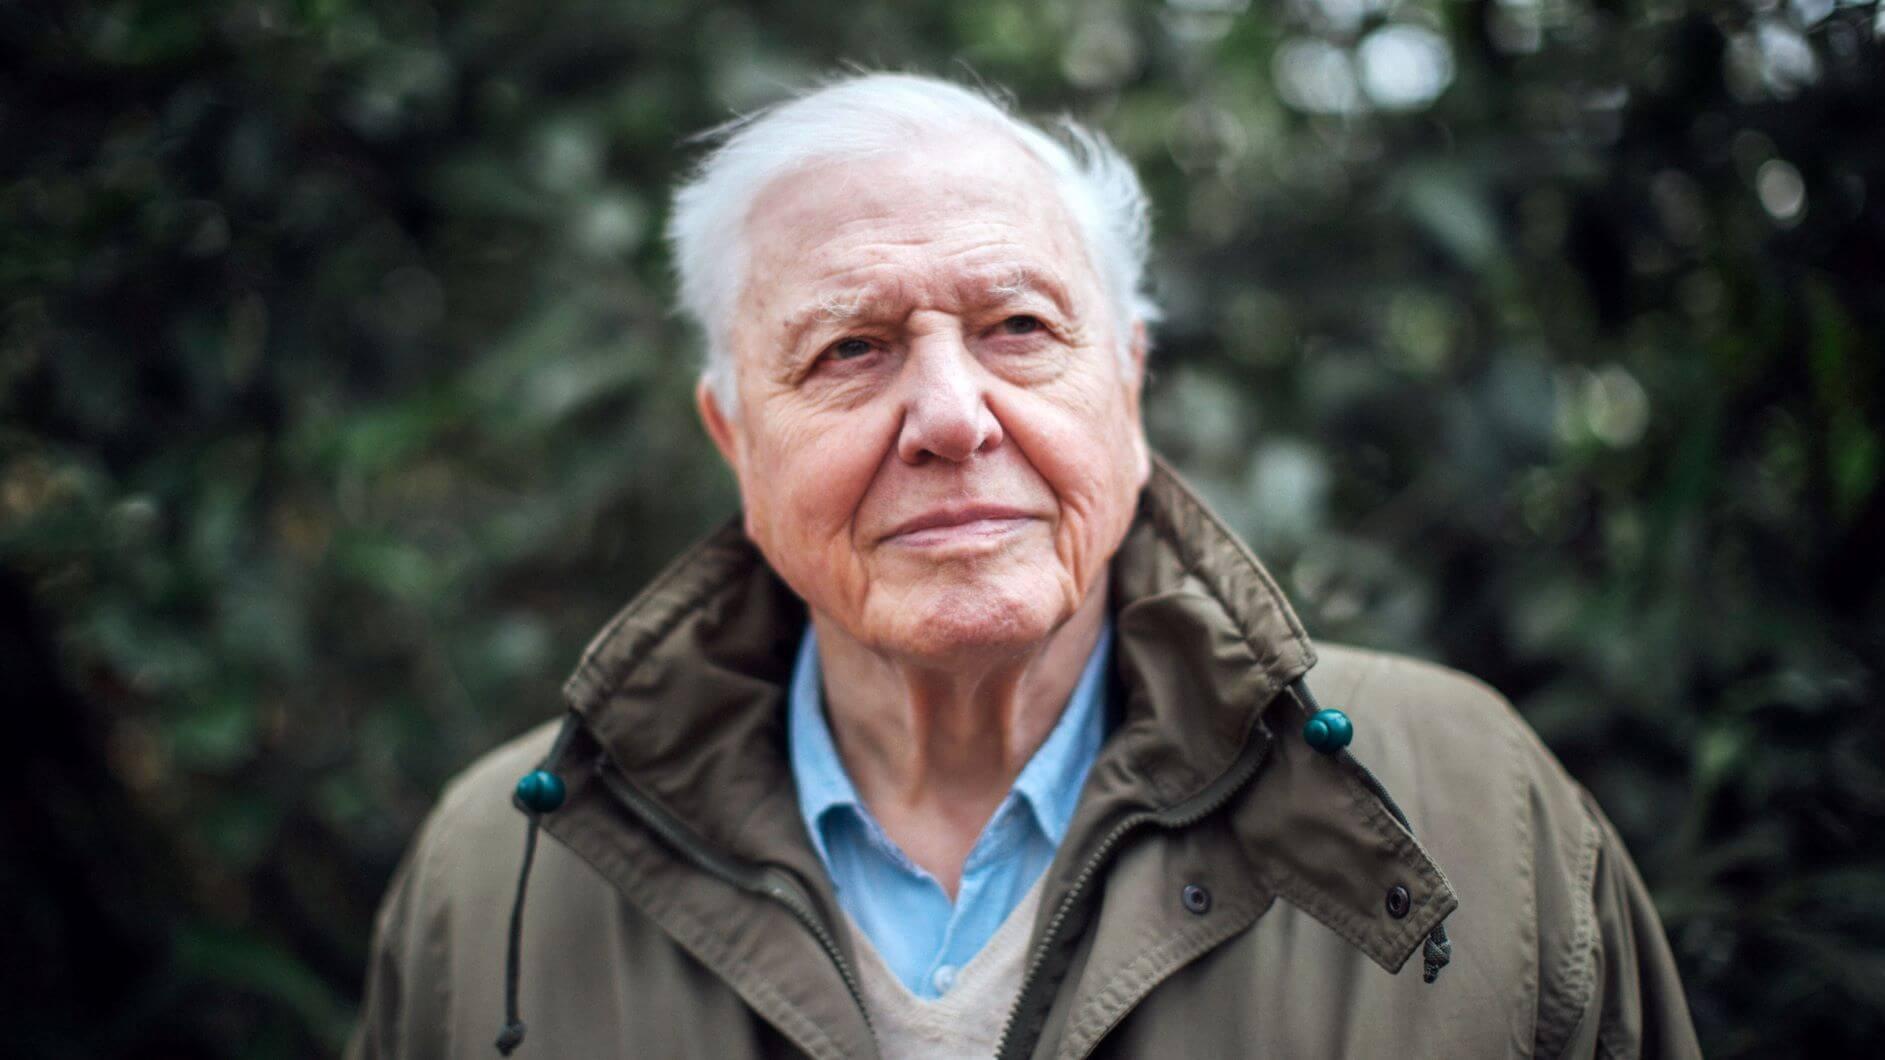 Plastic Pollution An Unfolding Catastrophe, Says Sir David Attenborough